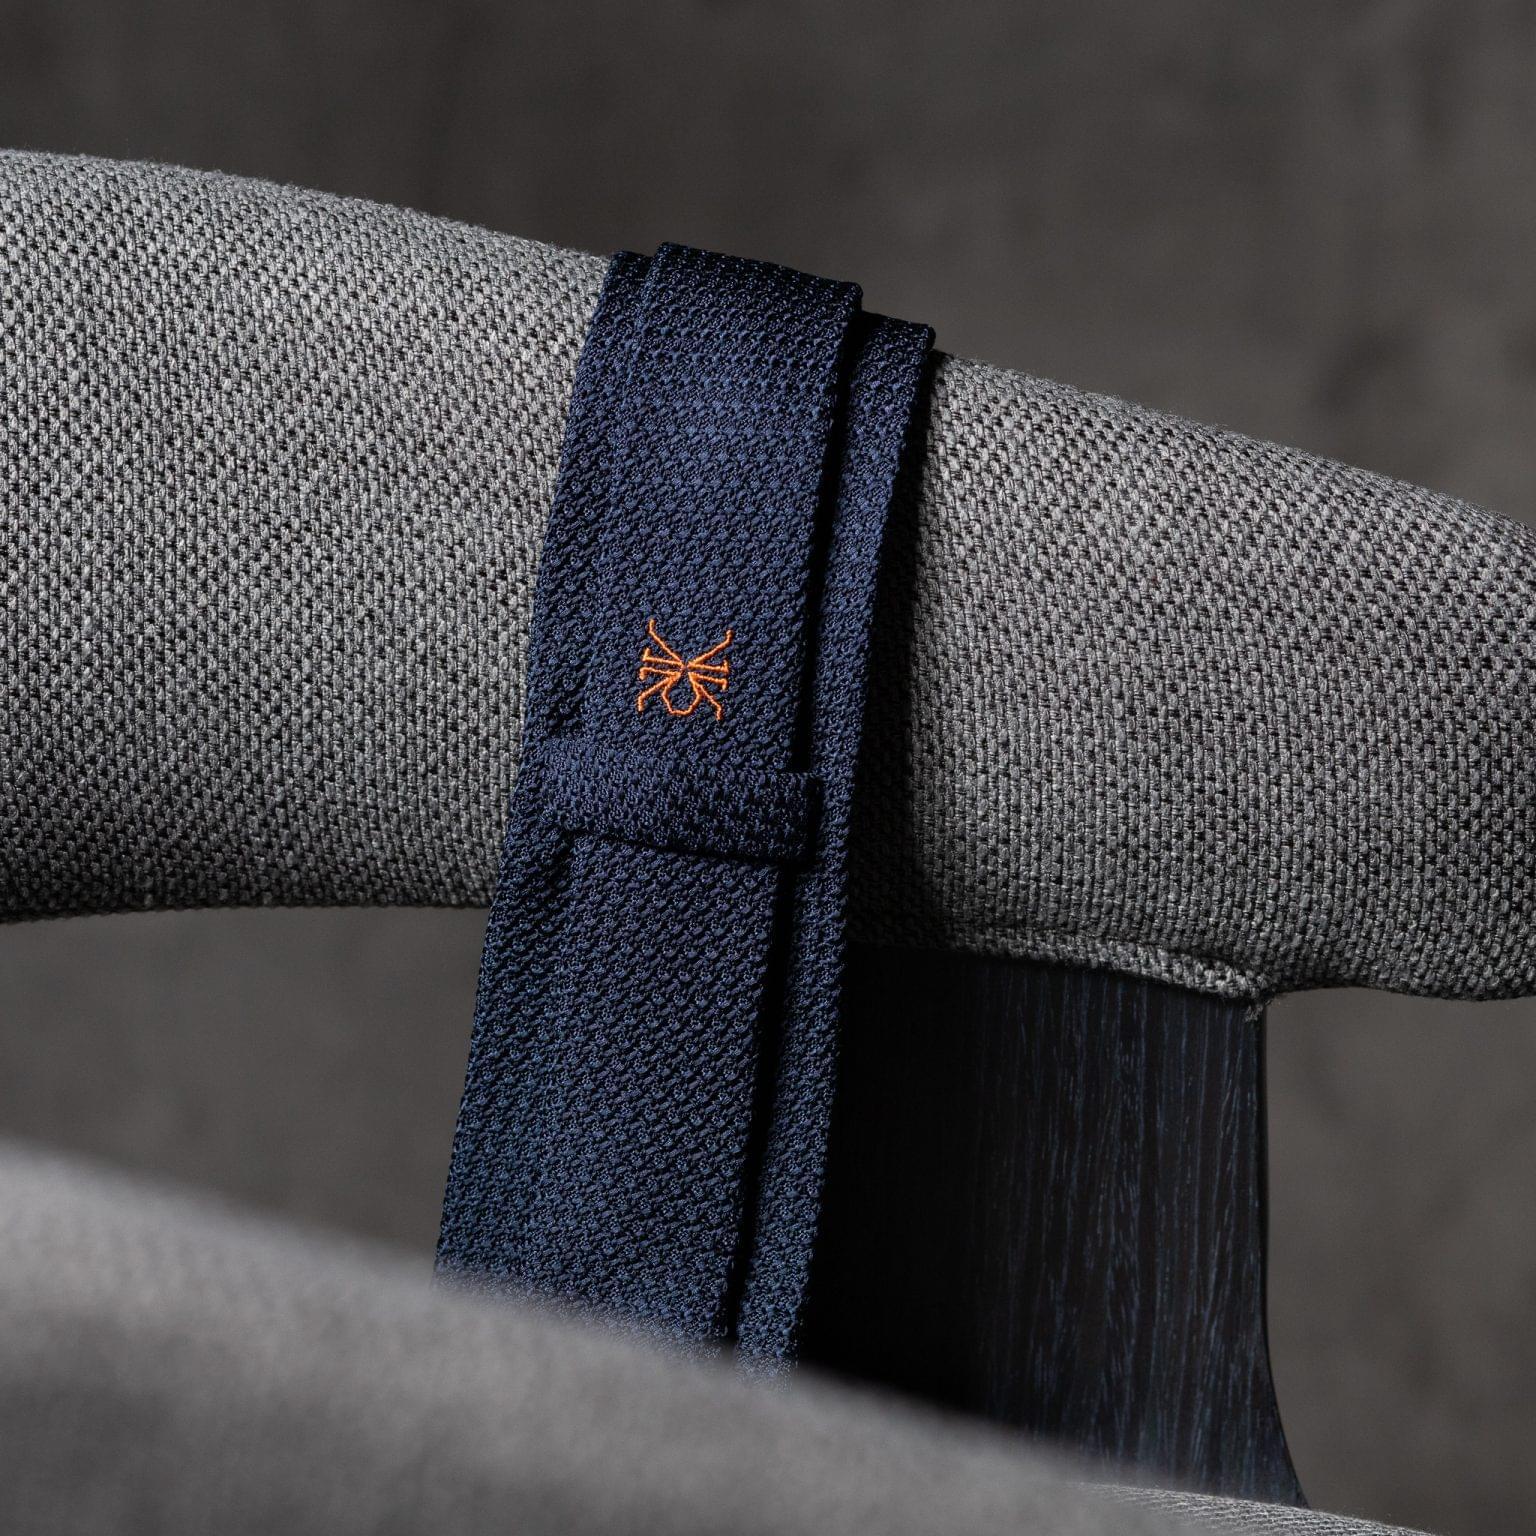 GRENADINE-0146-Tie-Initials-Corbata-Iniciales-The-Seelk-4